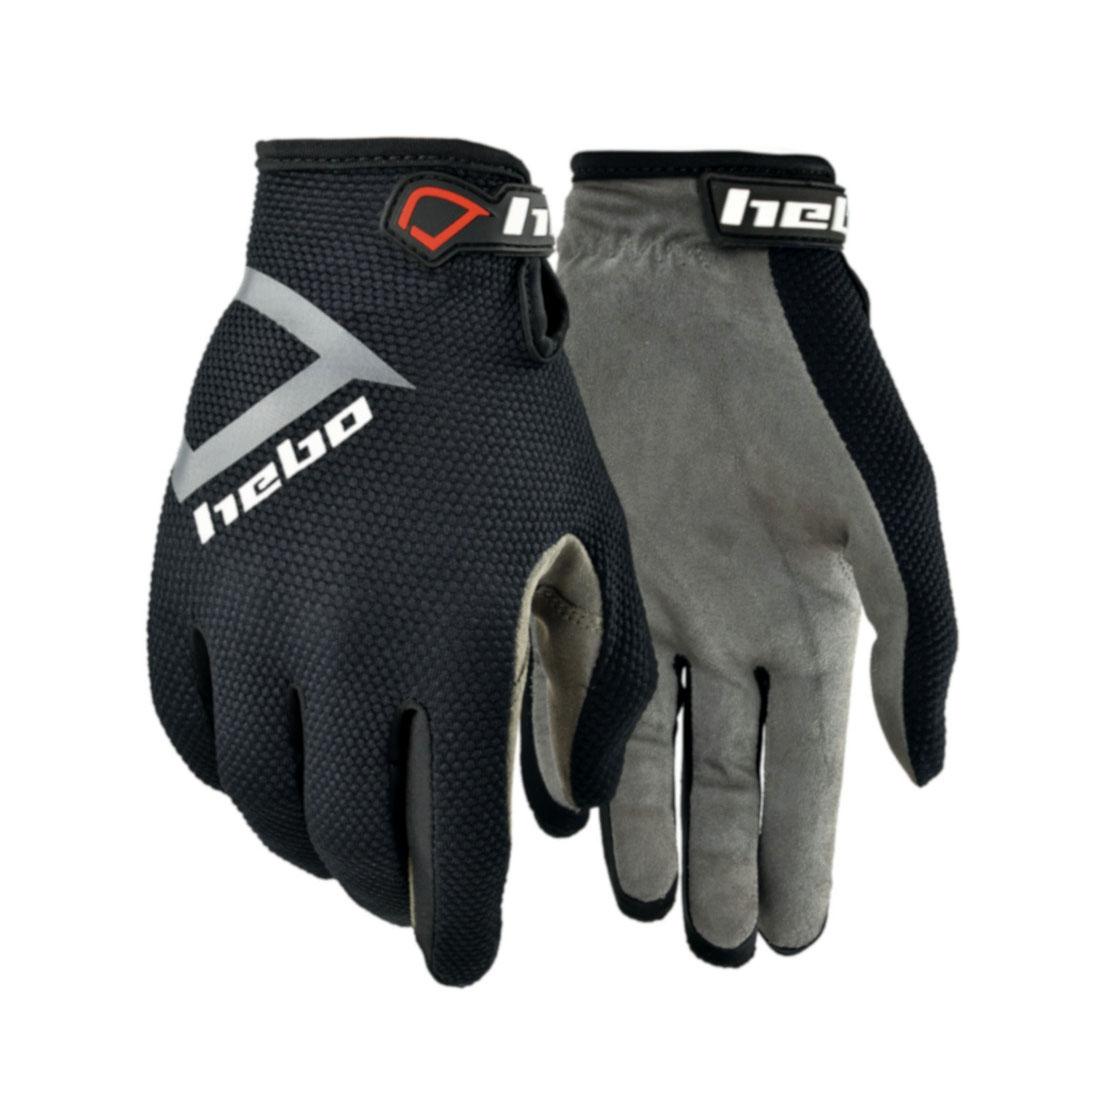 Hebo Nano Pro III Trials Gloves (Black)